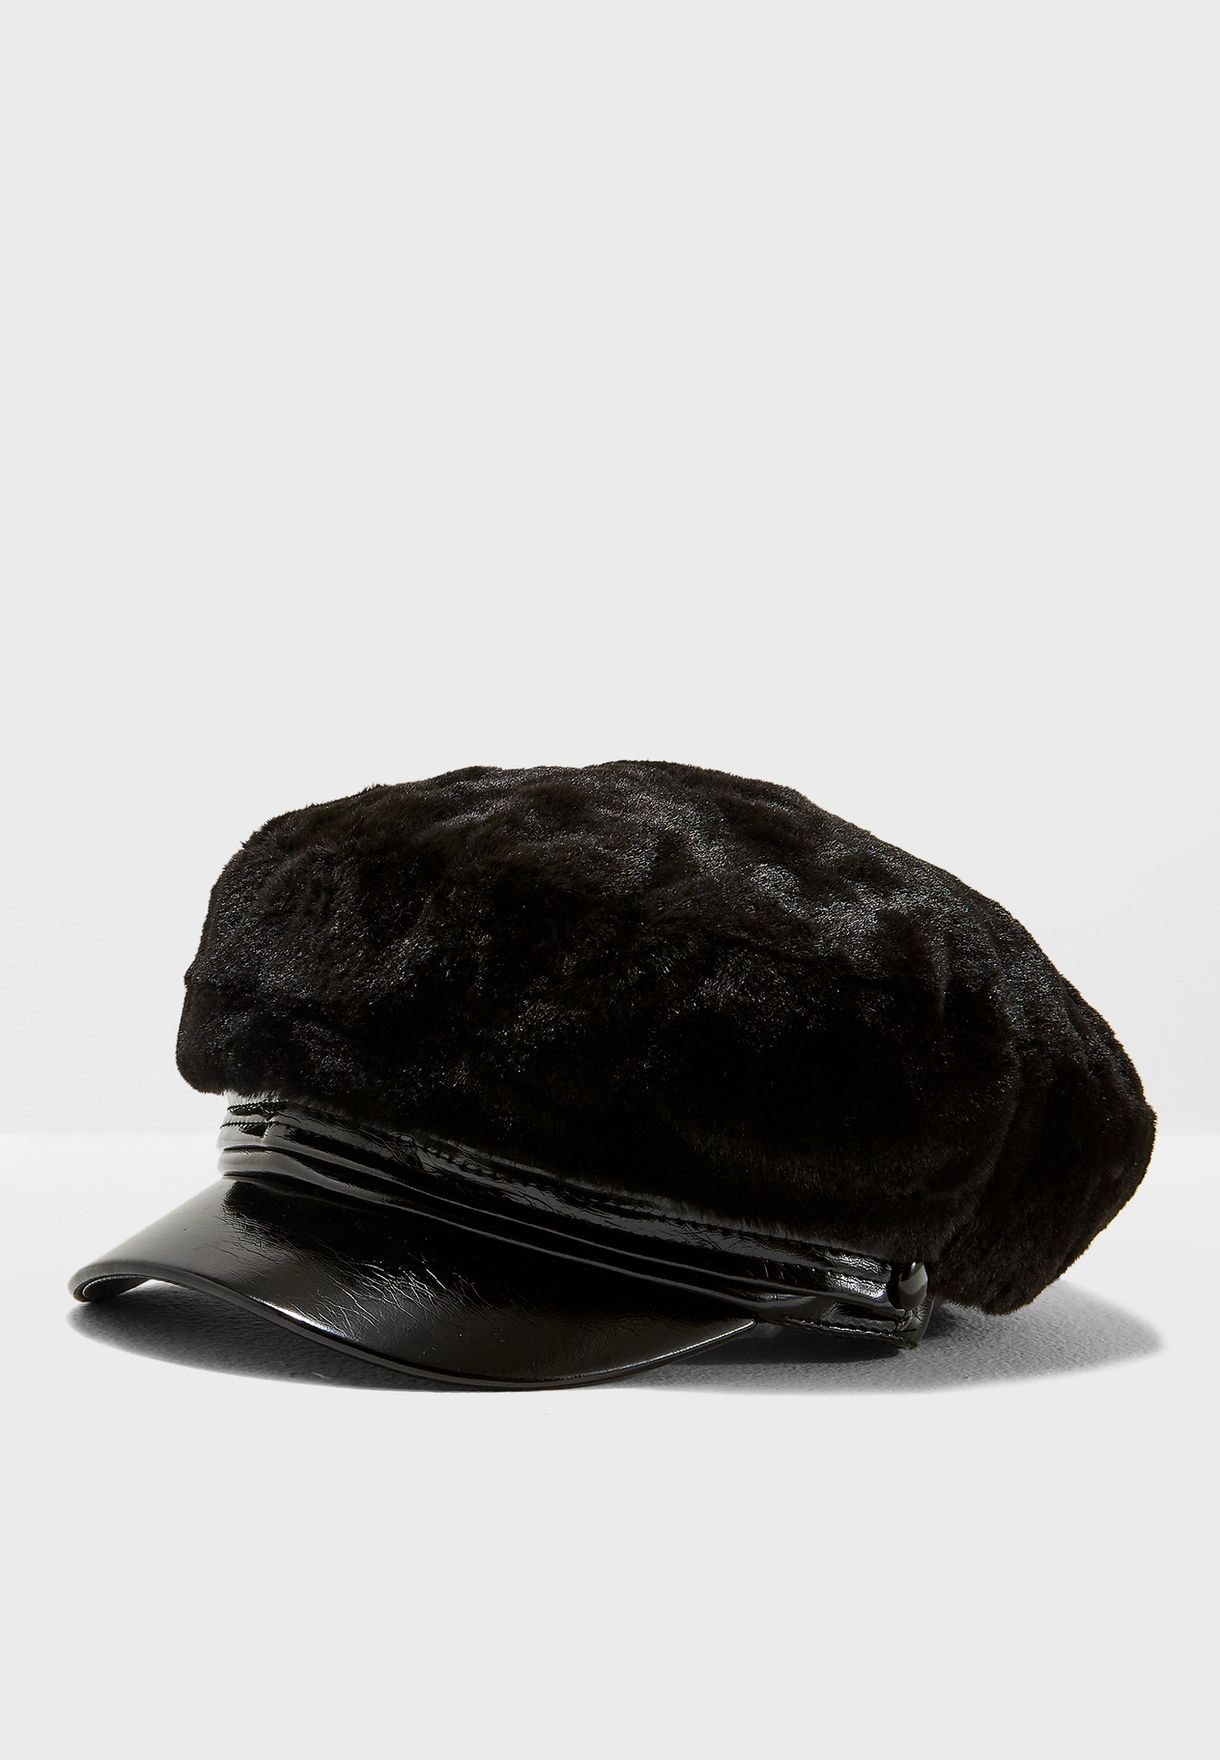 Shop Topshop black Faux Fur Baker Boy Hat 19K88NBLK for Women in Qatar -  TO856AC72AYD 92e763cc55